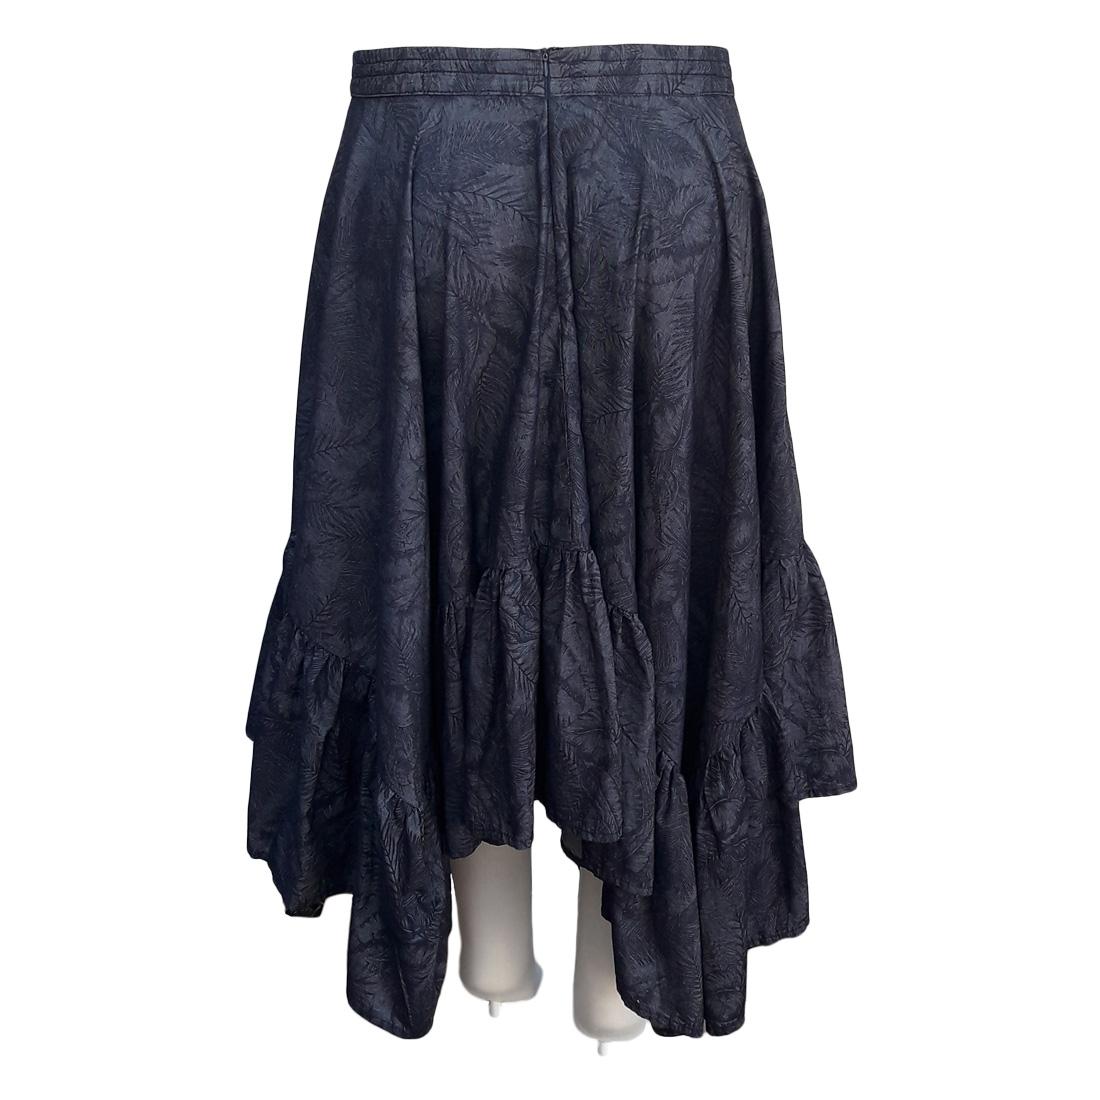 Saia Jeans Godê Assimétrica Moda Evangélica Plus Size